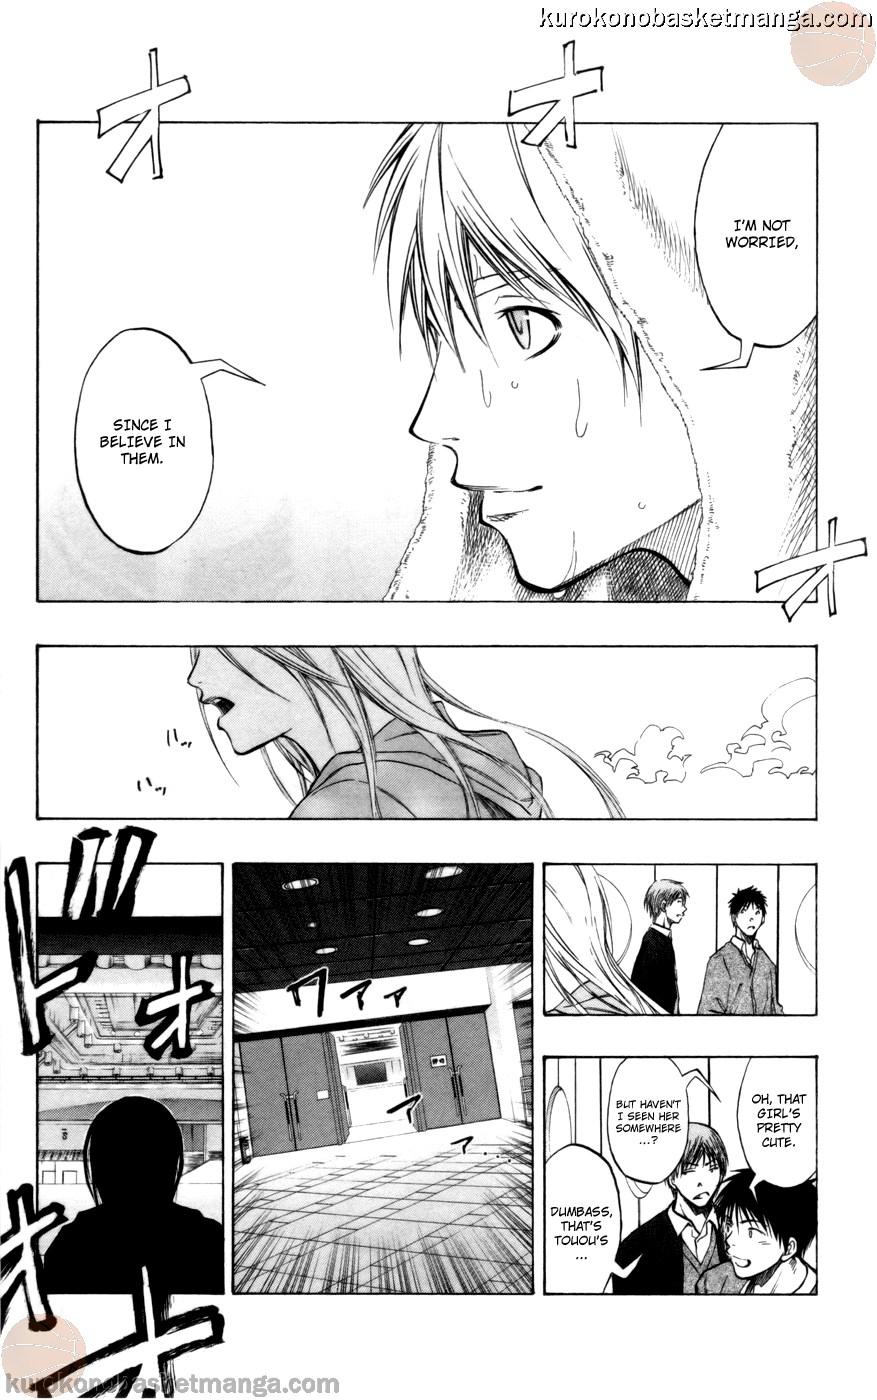 Kuroko no Basket Manga Chapter 88 - Image 05